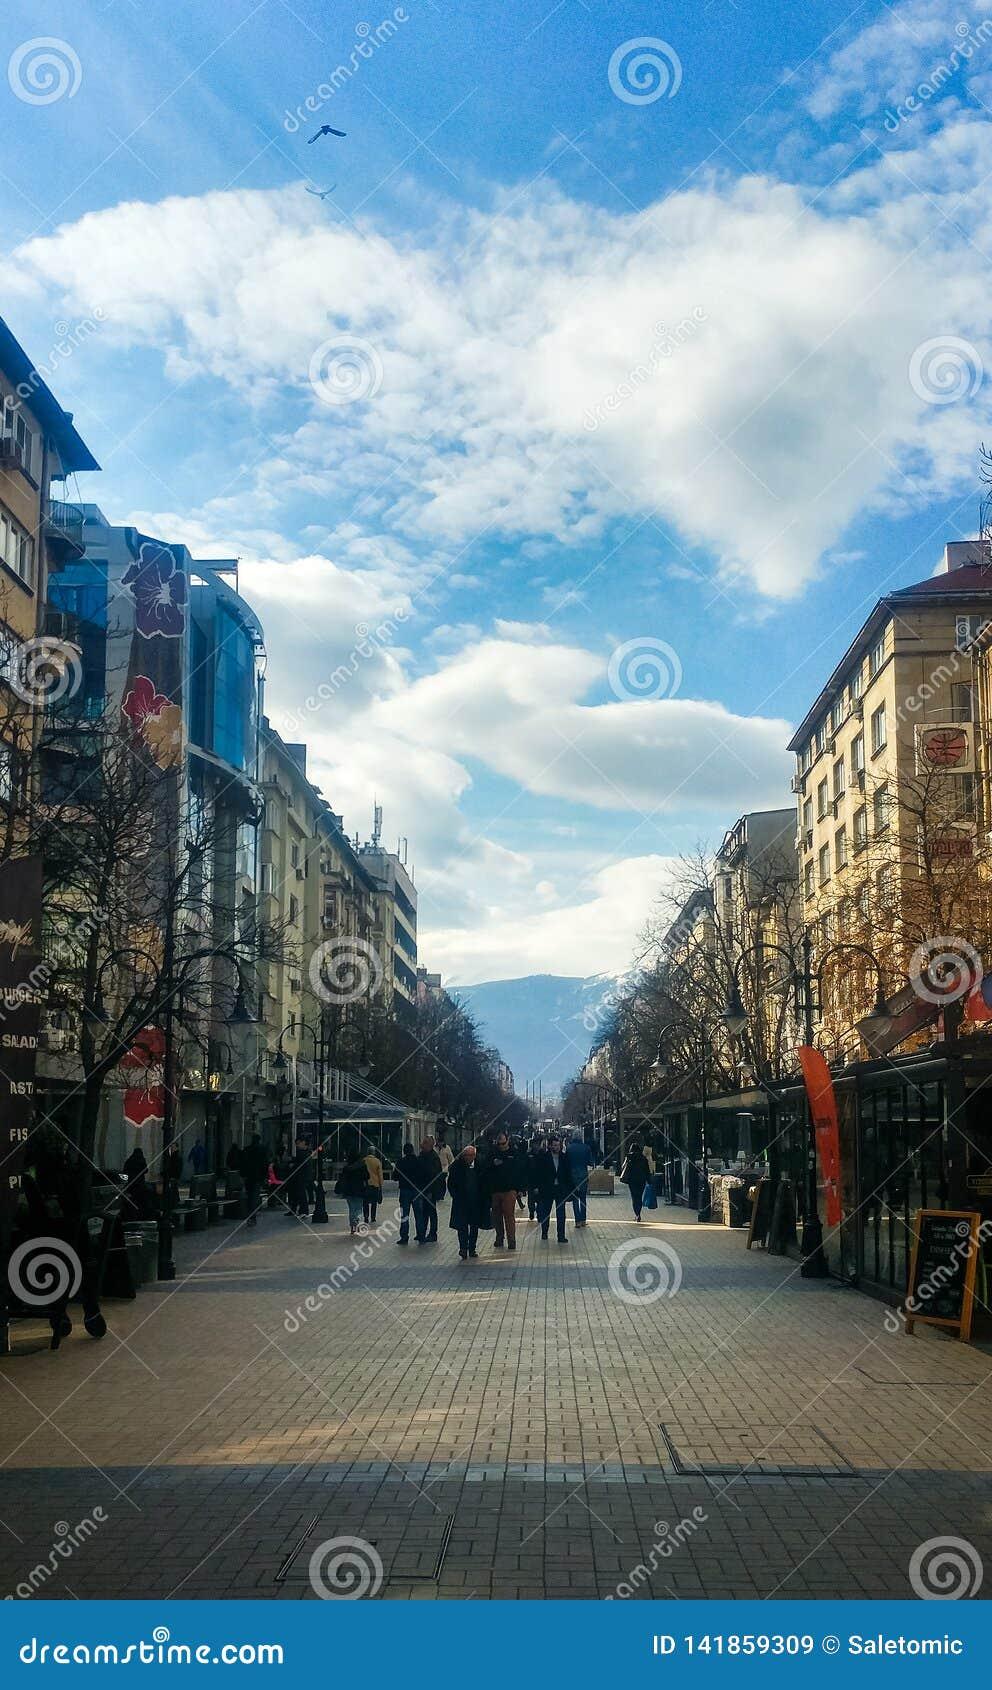 Sofia, Βουλγαρία - 11 Μαρτίου 2019: Για τους πεζούς οδός περπατήματος της Sofia μια ηλιόλουστη ημέρα